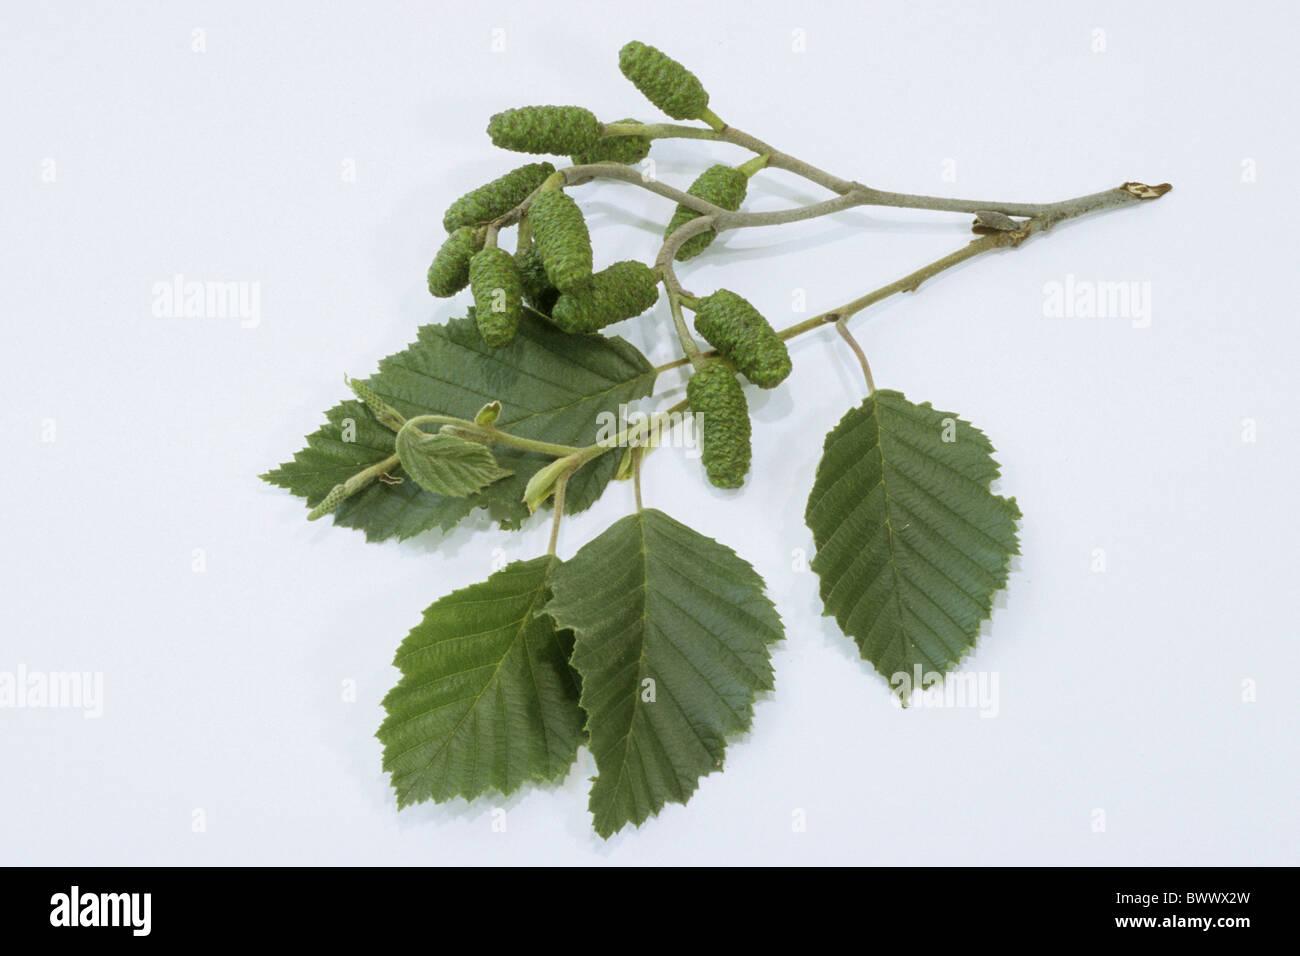 Grey Alder, Gray Alder (Alnus incana), twig with leaves and fruit, studio picture. - Stock Image